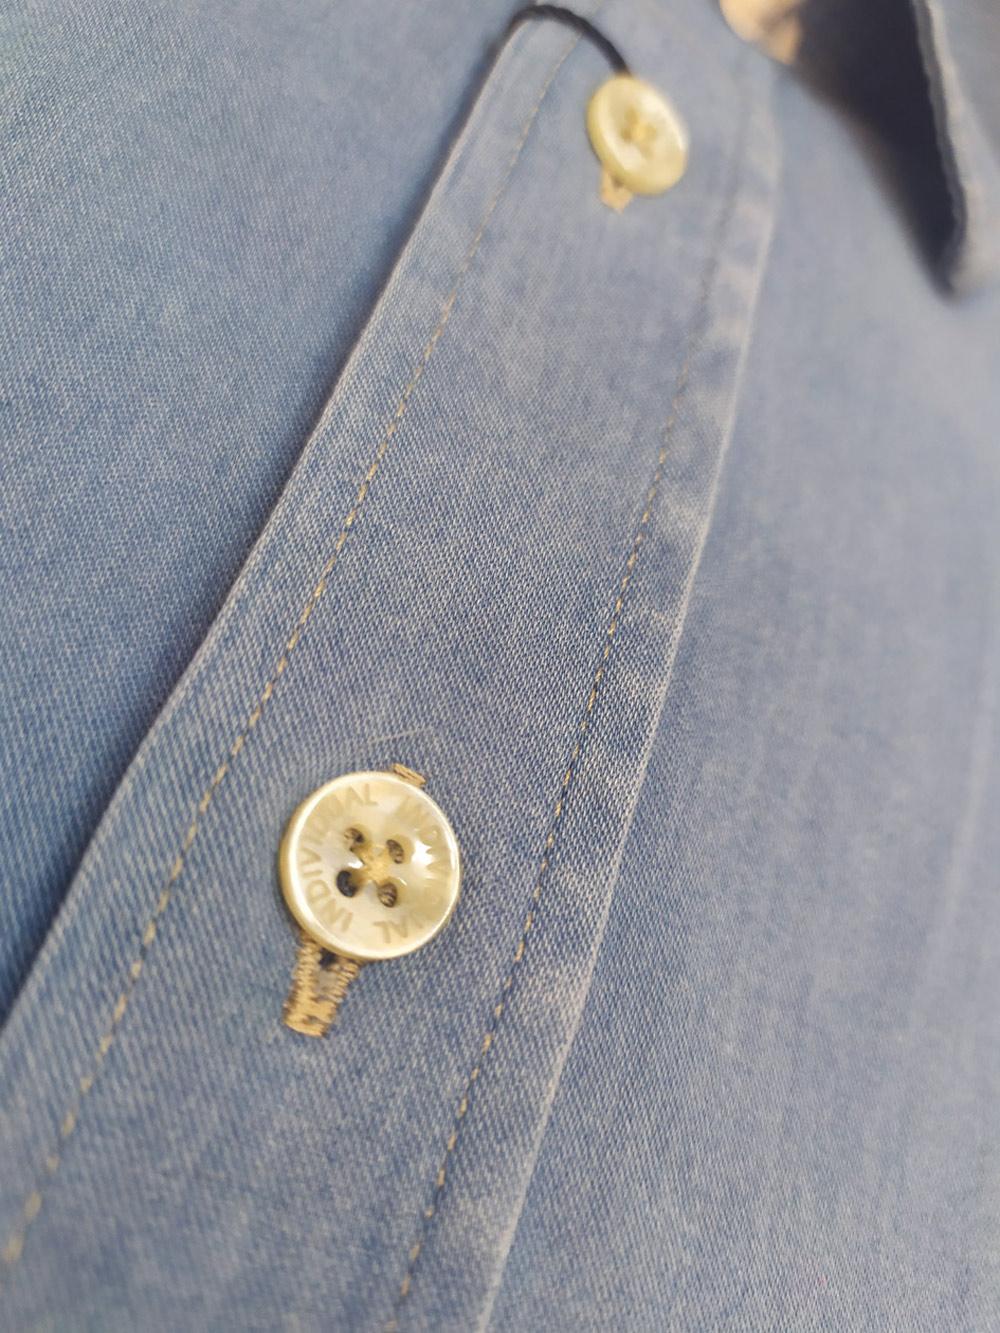 Camisa Masculina Jeans Meia Manga com Bolso Clássico Comfort Individual